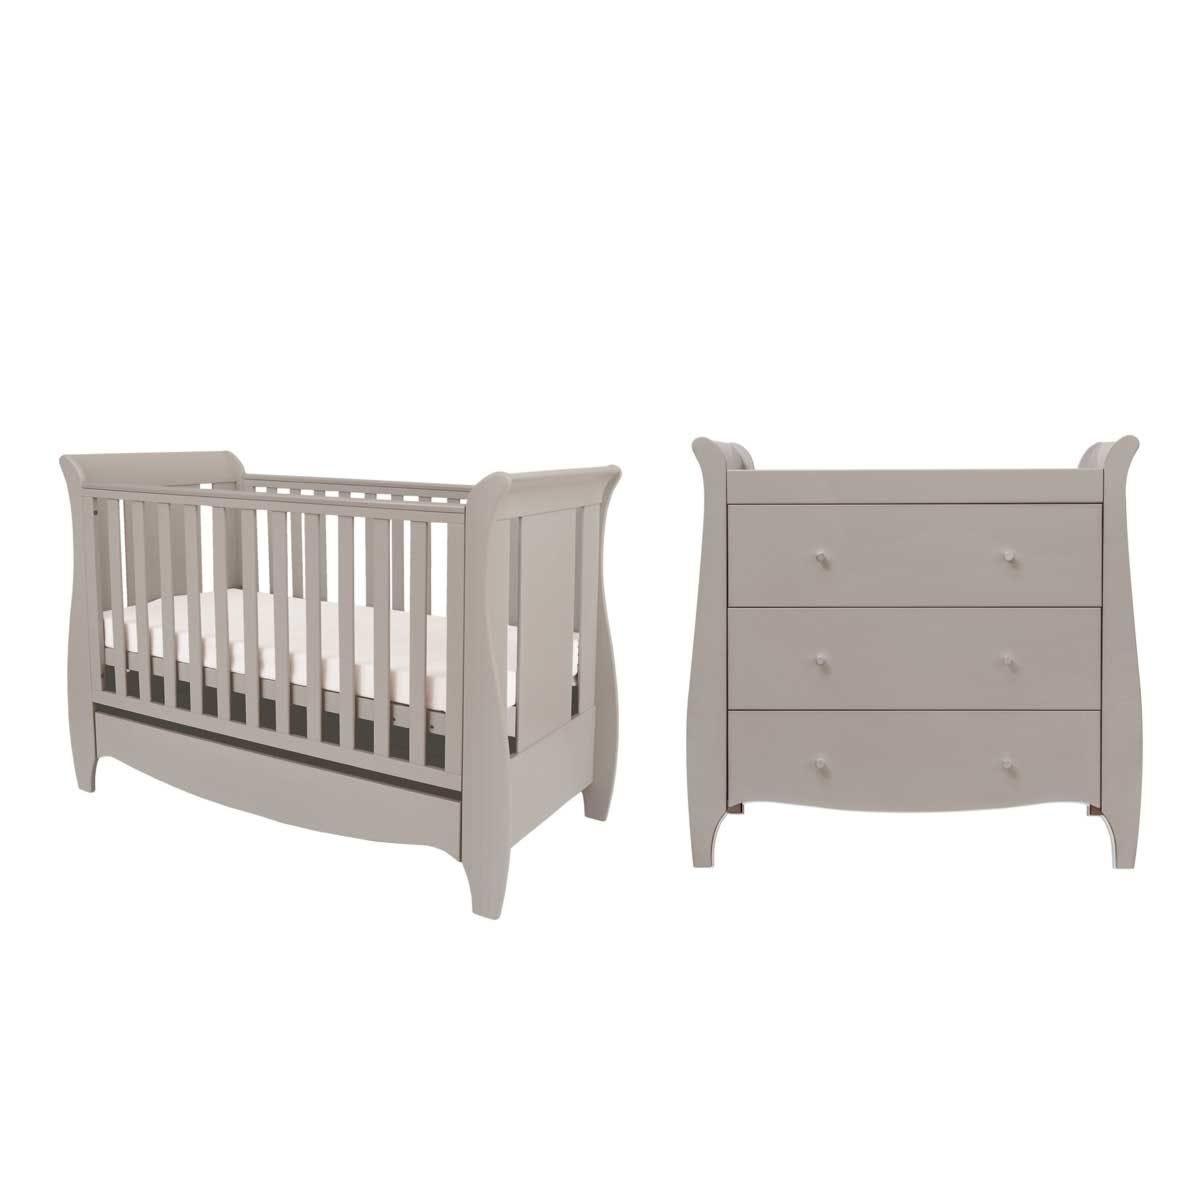 Tutti Bambini Roma Mini 2 Piece Room Set - Truffle Grey